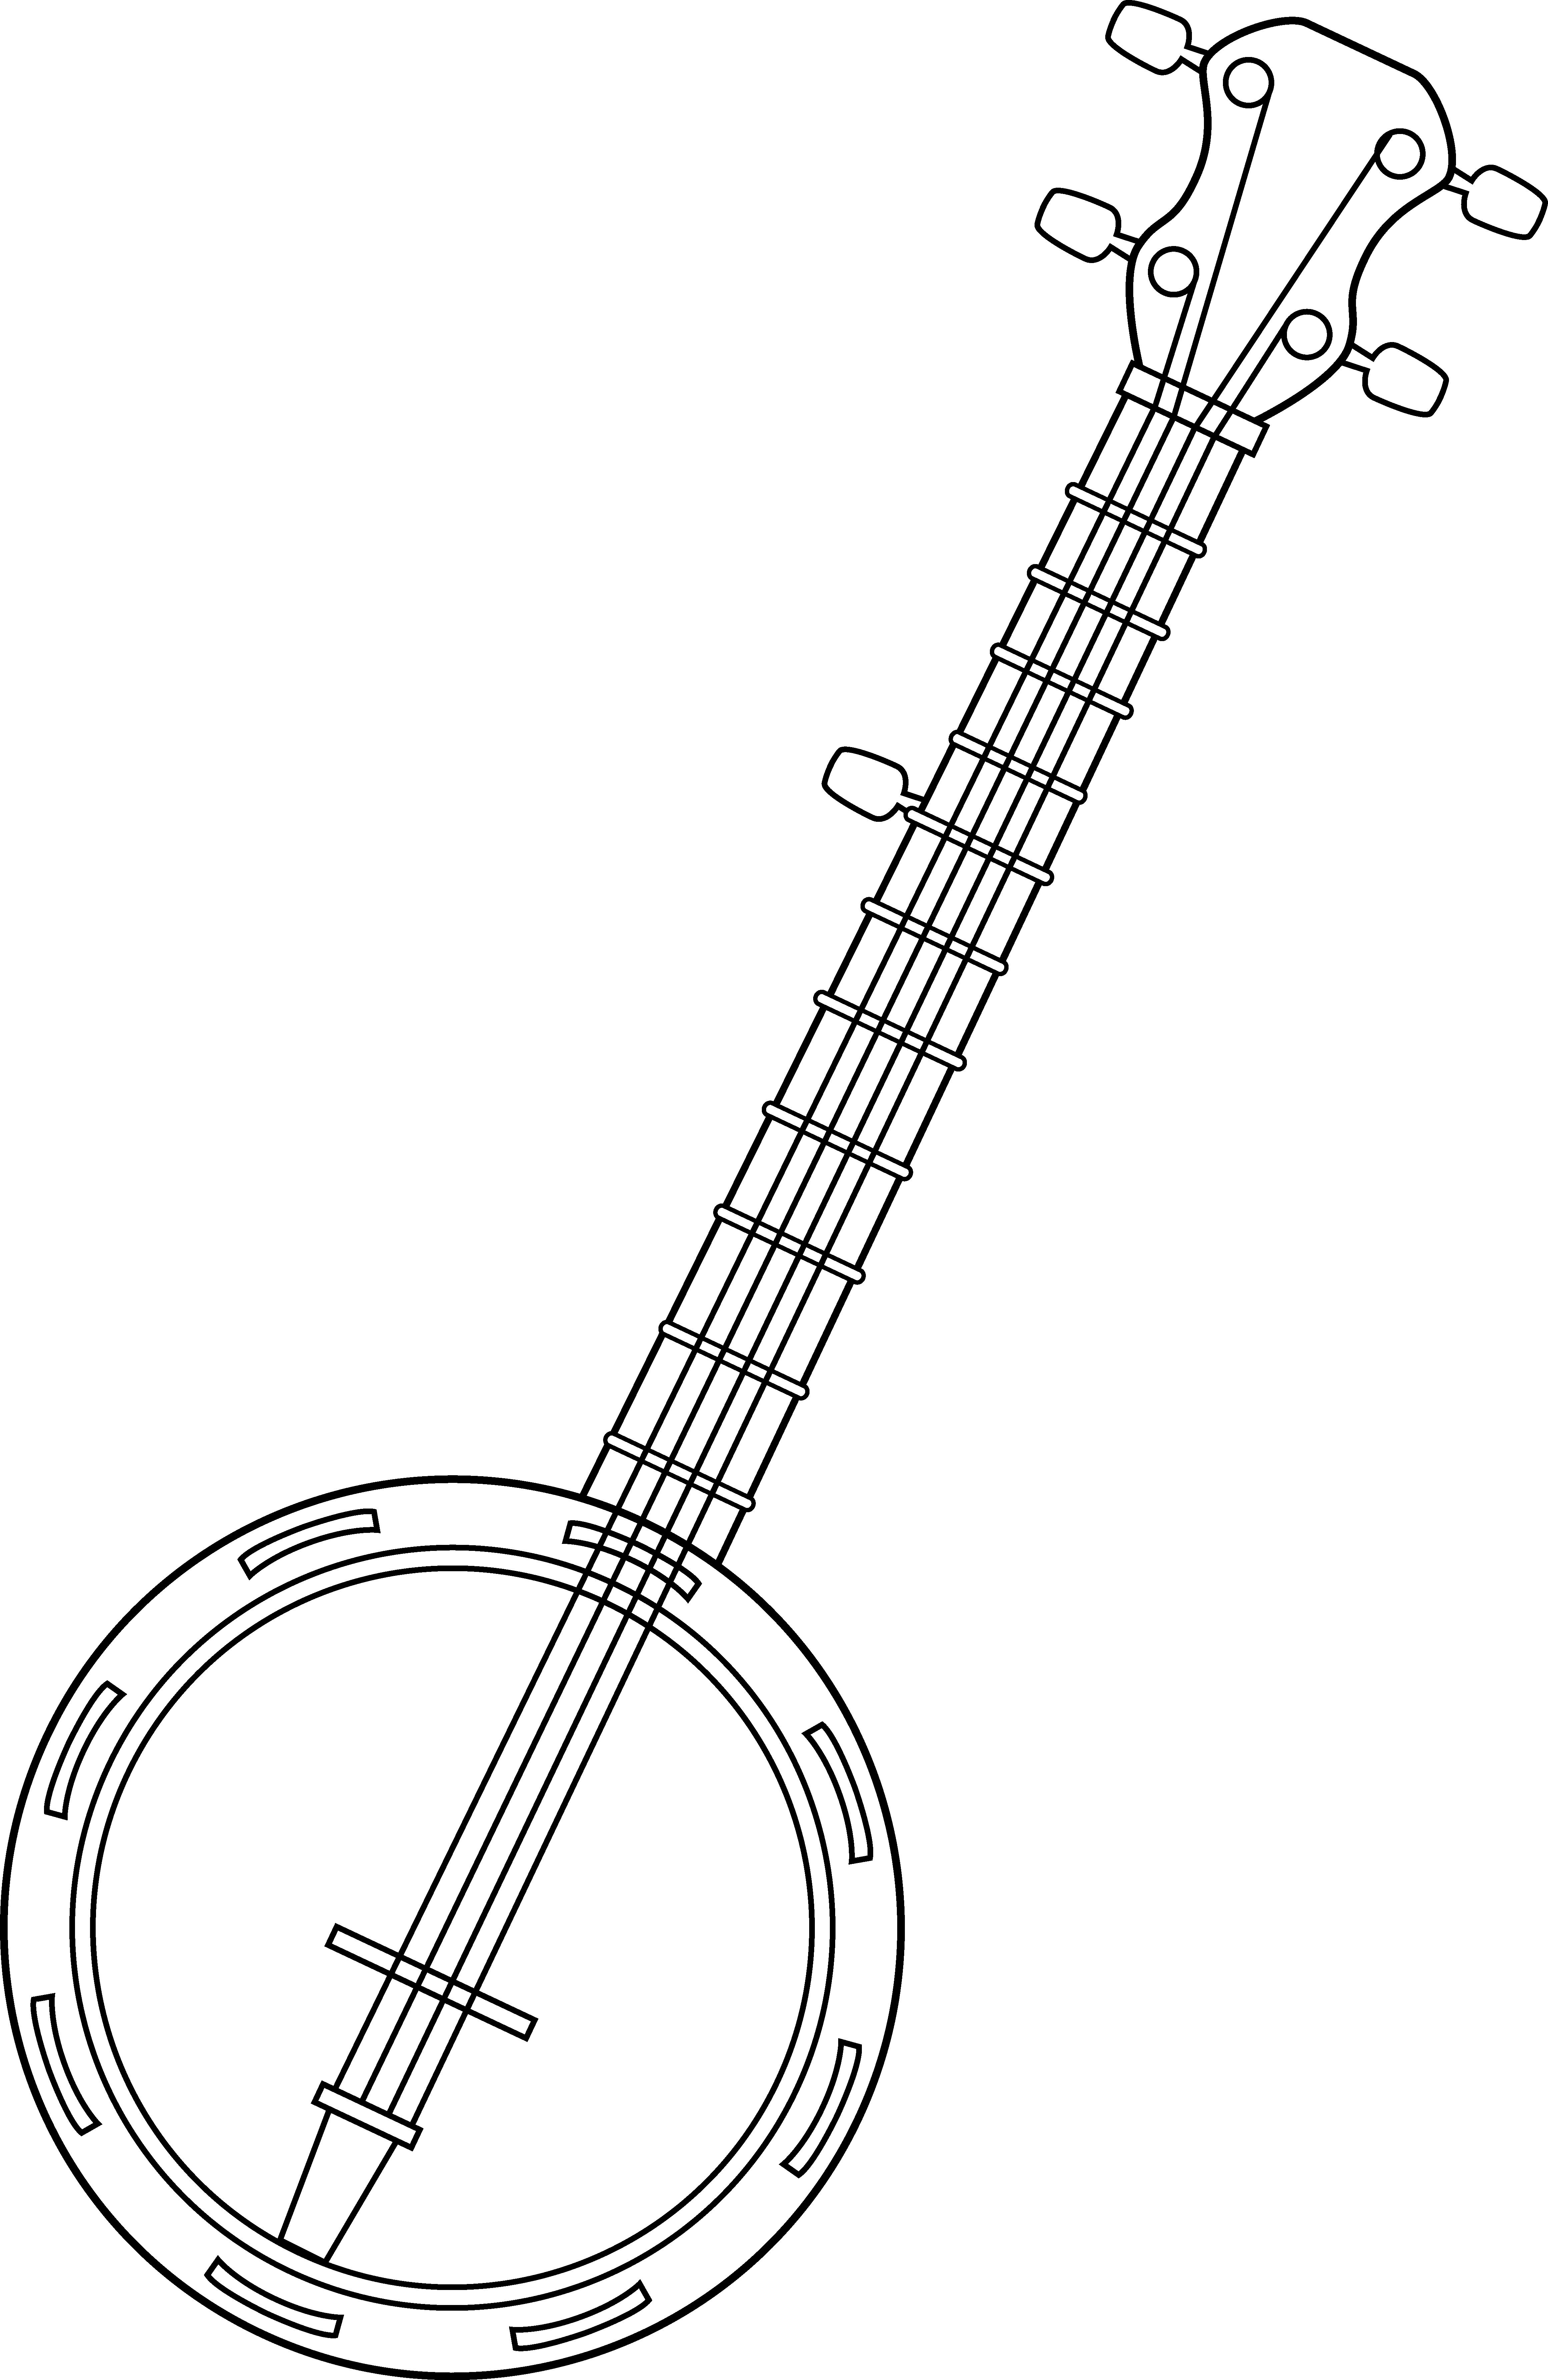 Banjo Colorable Line Art Banjo Clipart Black And.